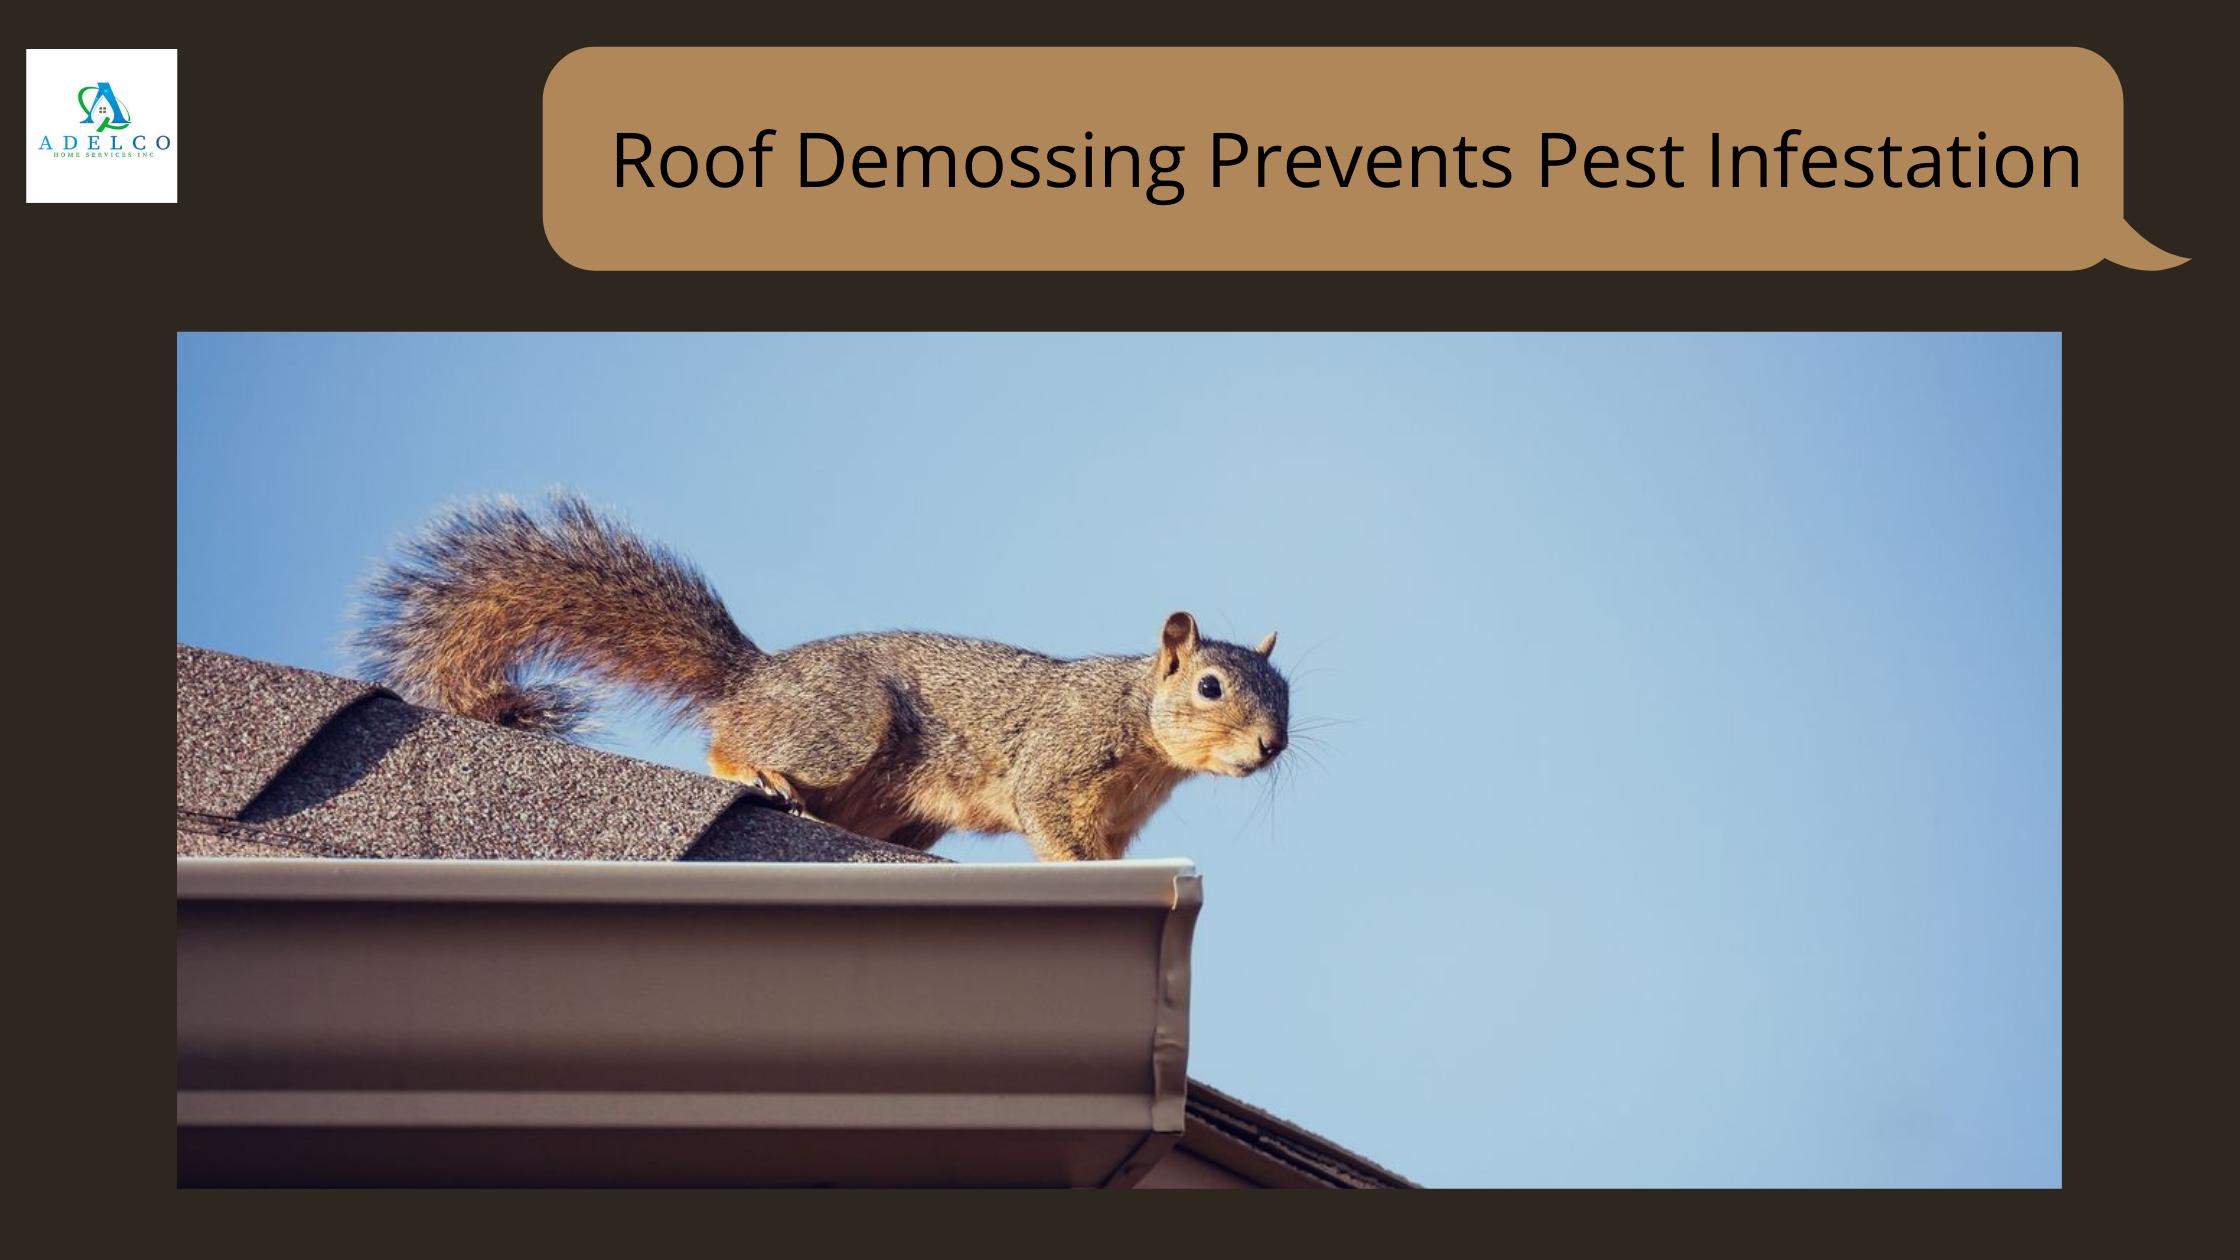 Roof Demossing Prevents Pest Infestation